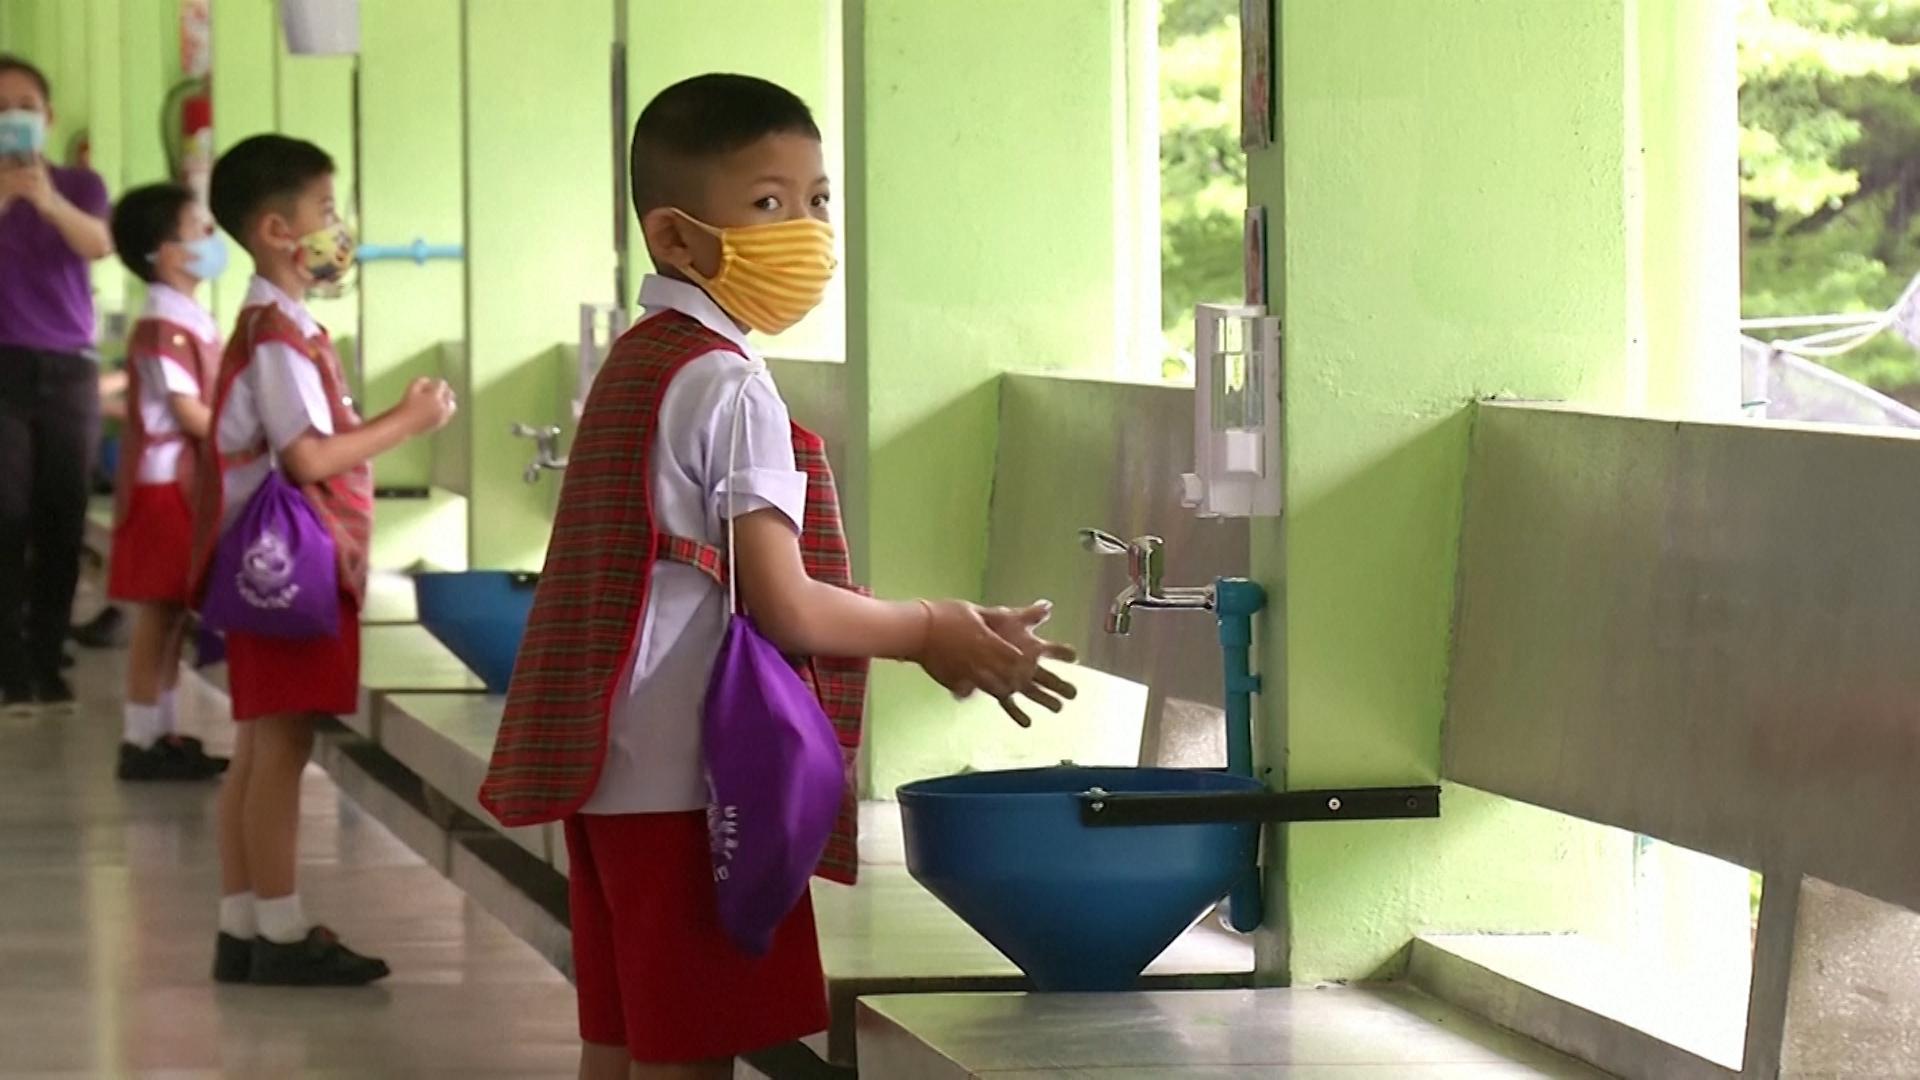 Thai kindergarten rehearses coronavirus prevention measures before schools reopen nationwide